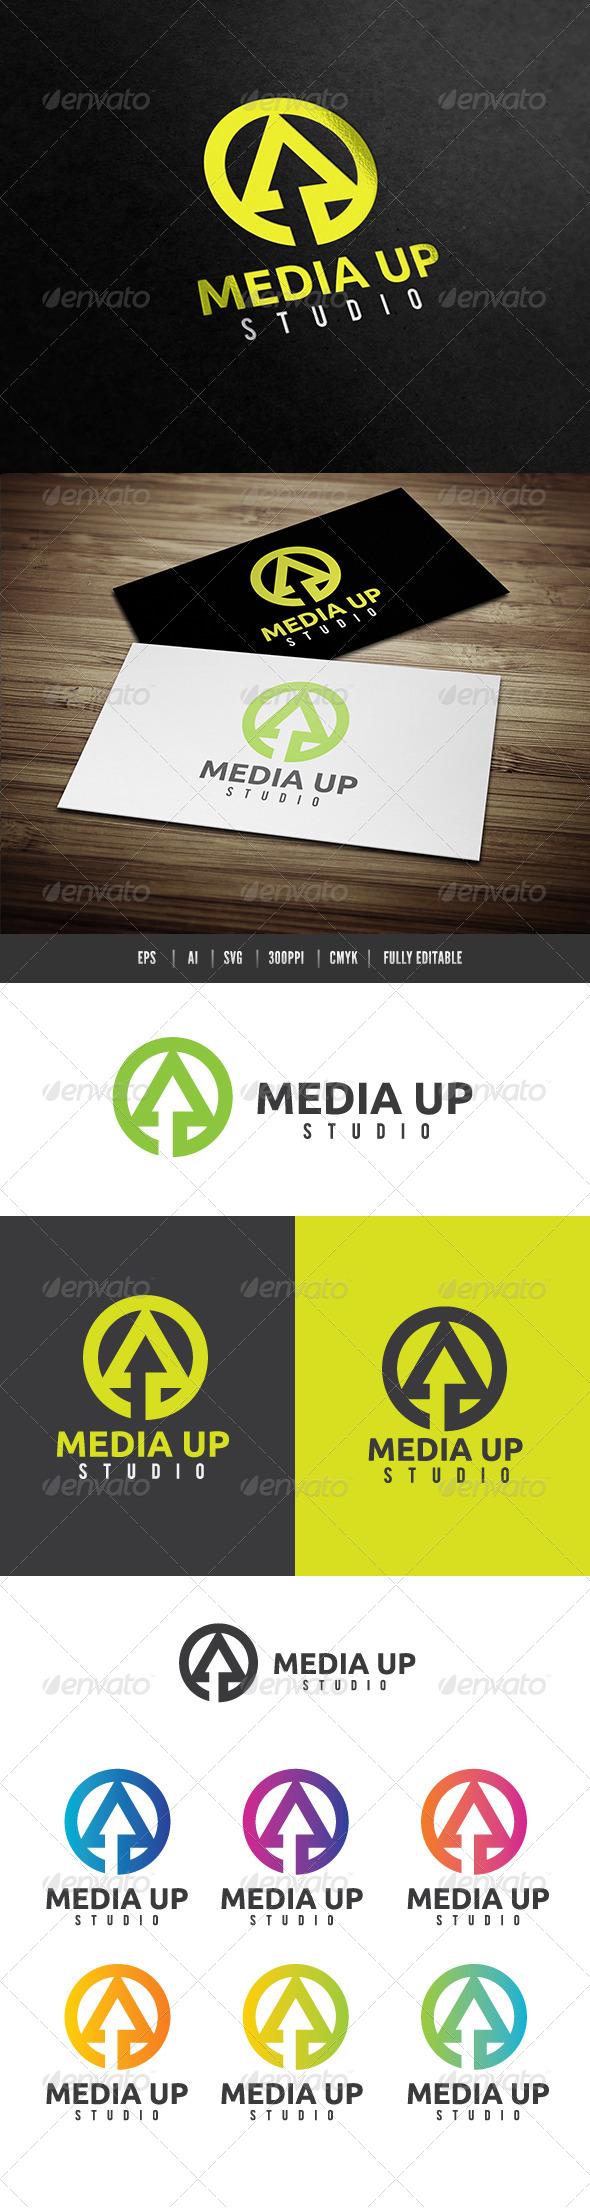 GraphicRiver Media Up 6501536